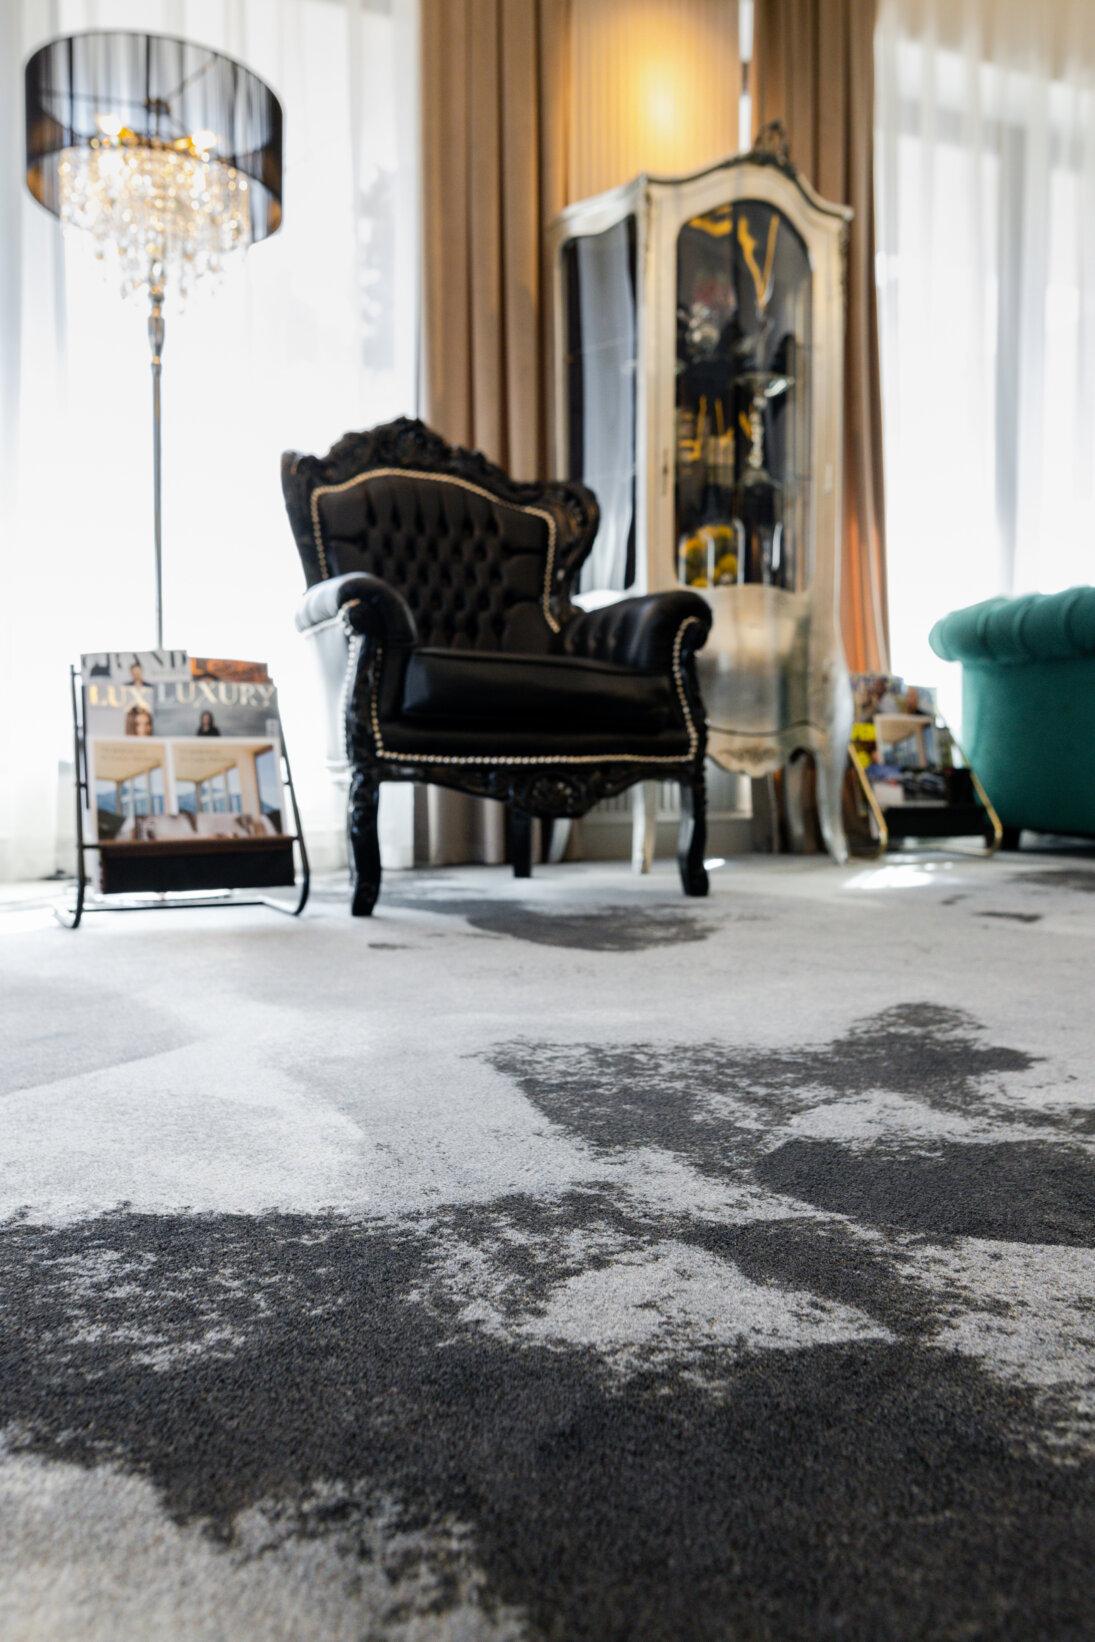 20210303-carpet&more-hotel-rocca-craiovaby-hugmedia-04